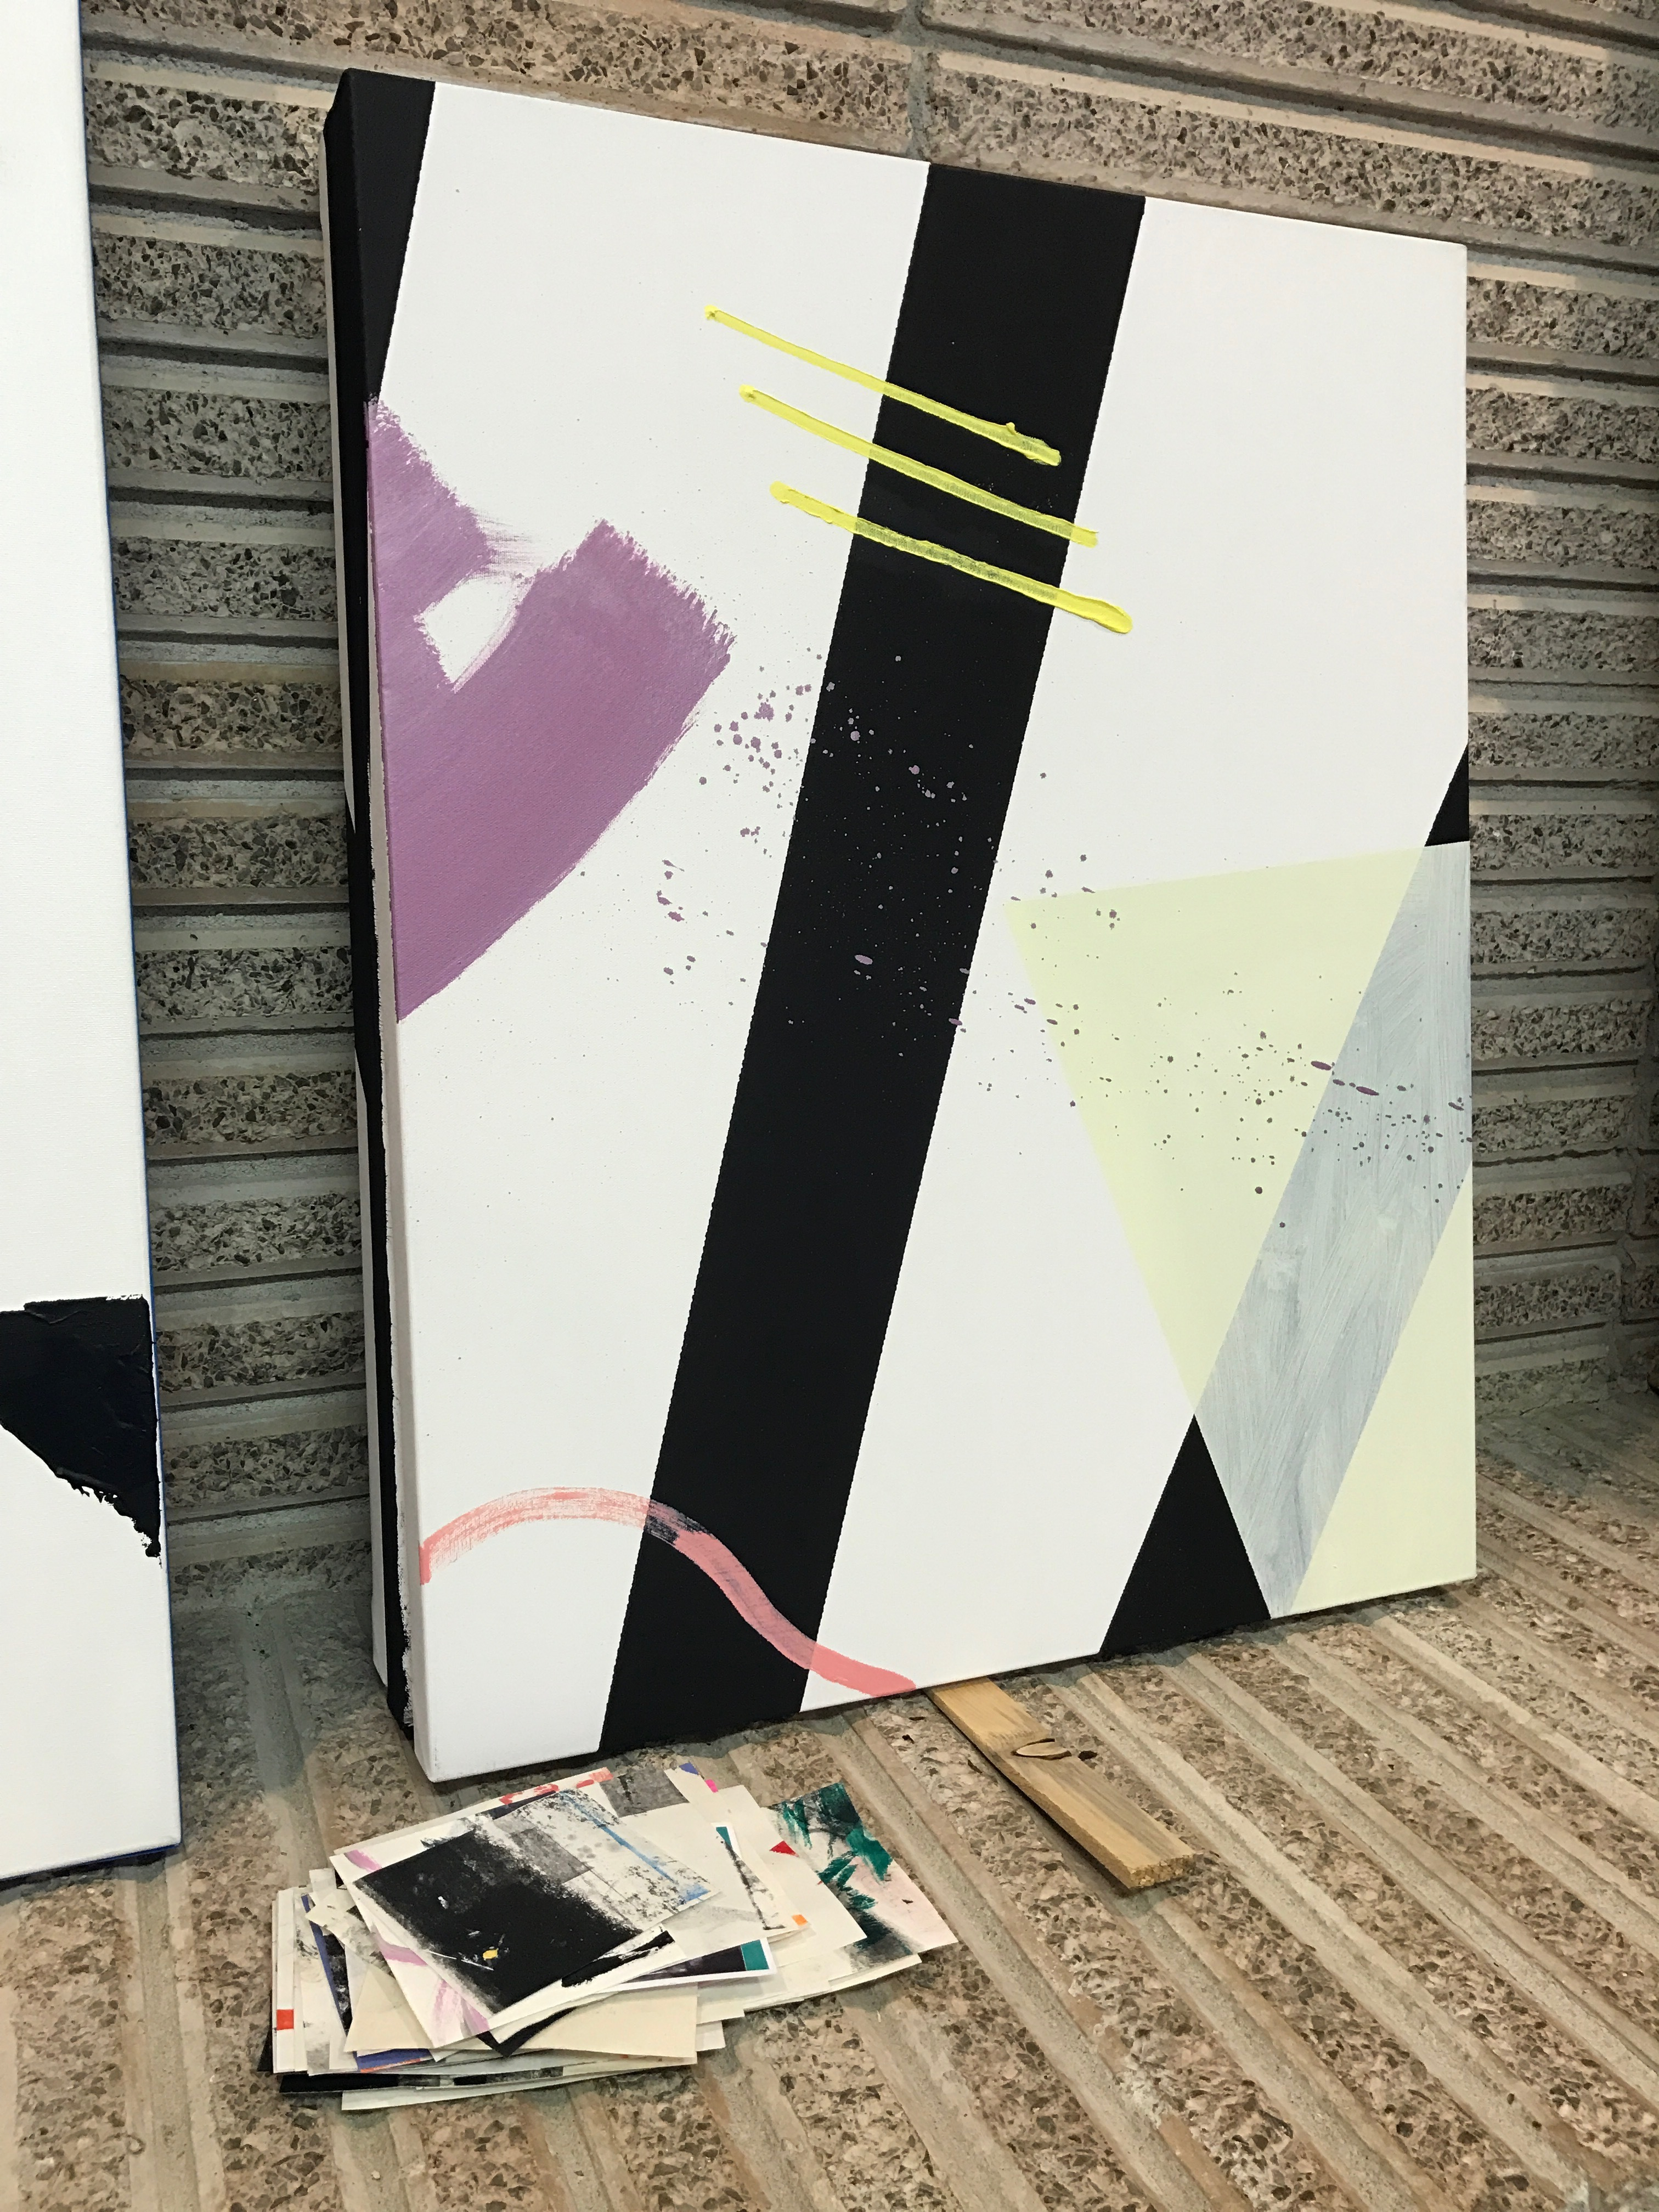 KJ Schumacher, Studio Visit, January 2017 (most works pictured are in progress)